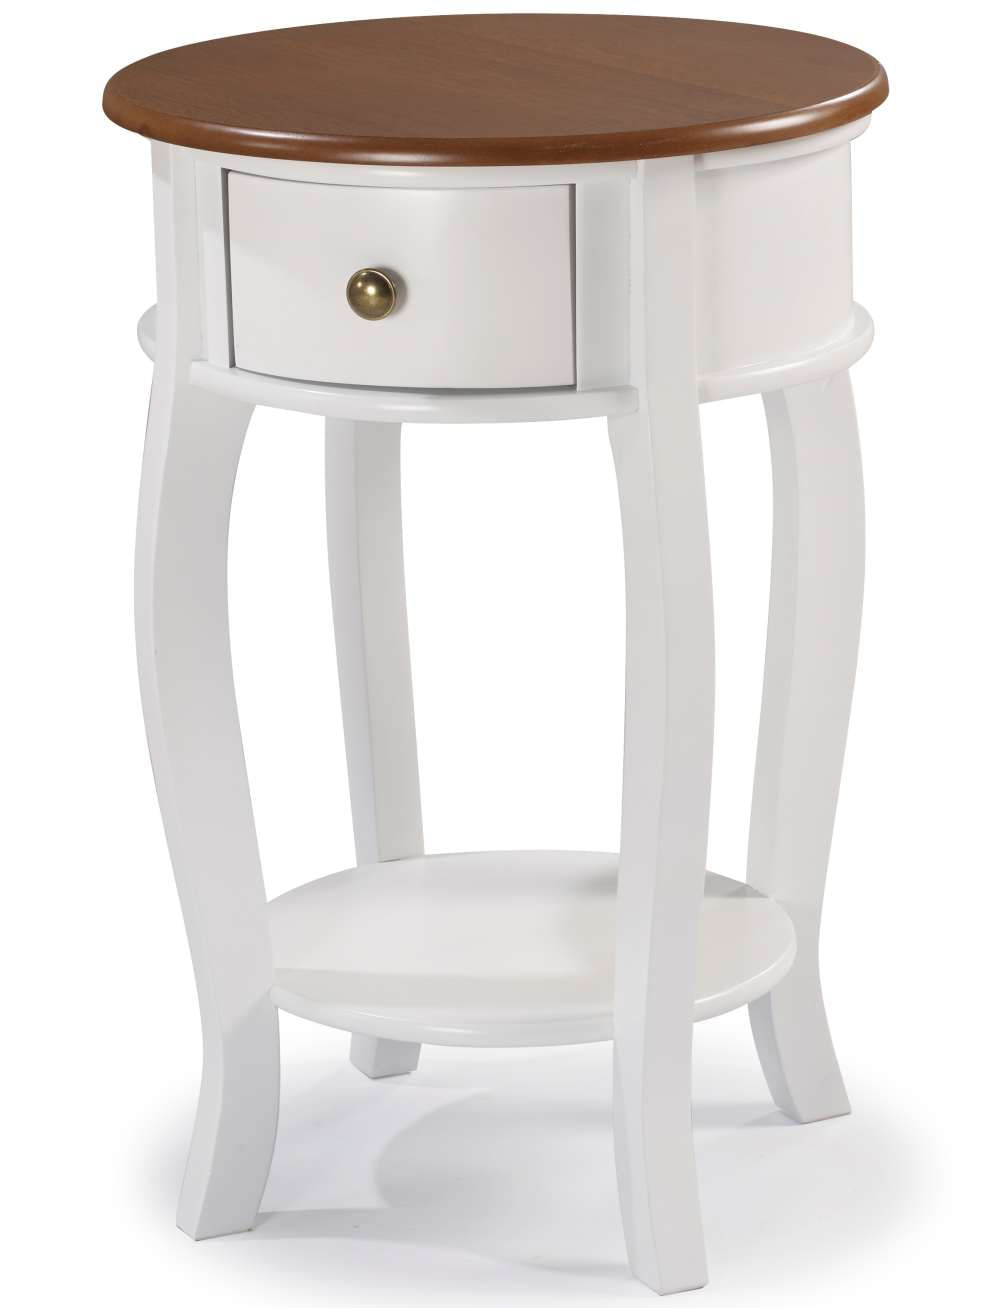 Mesa Apoio Elegance Branco Com Imbuia 50cm (Larg) - 58856